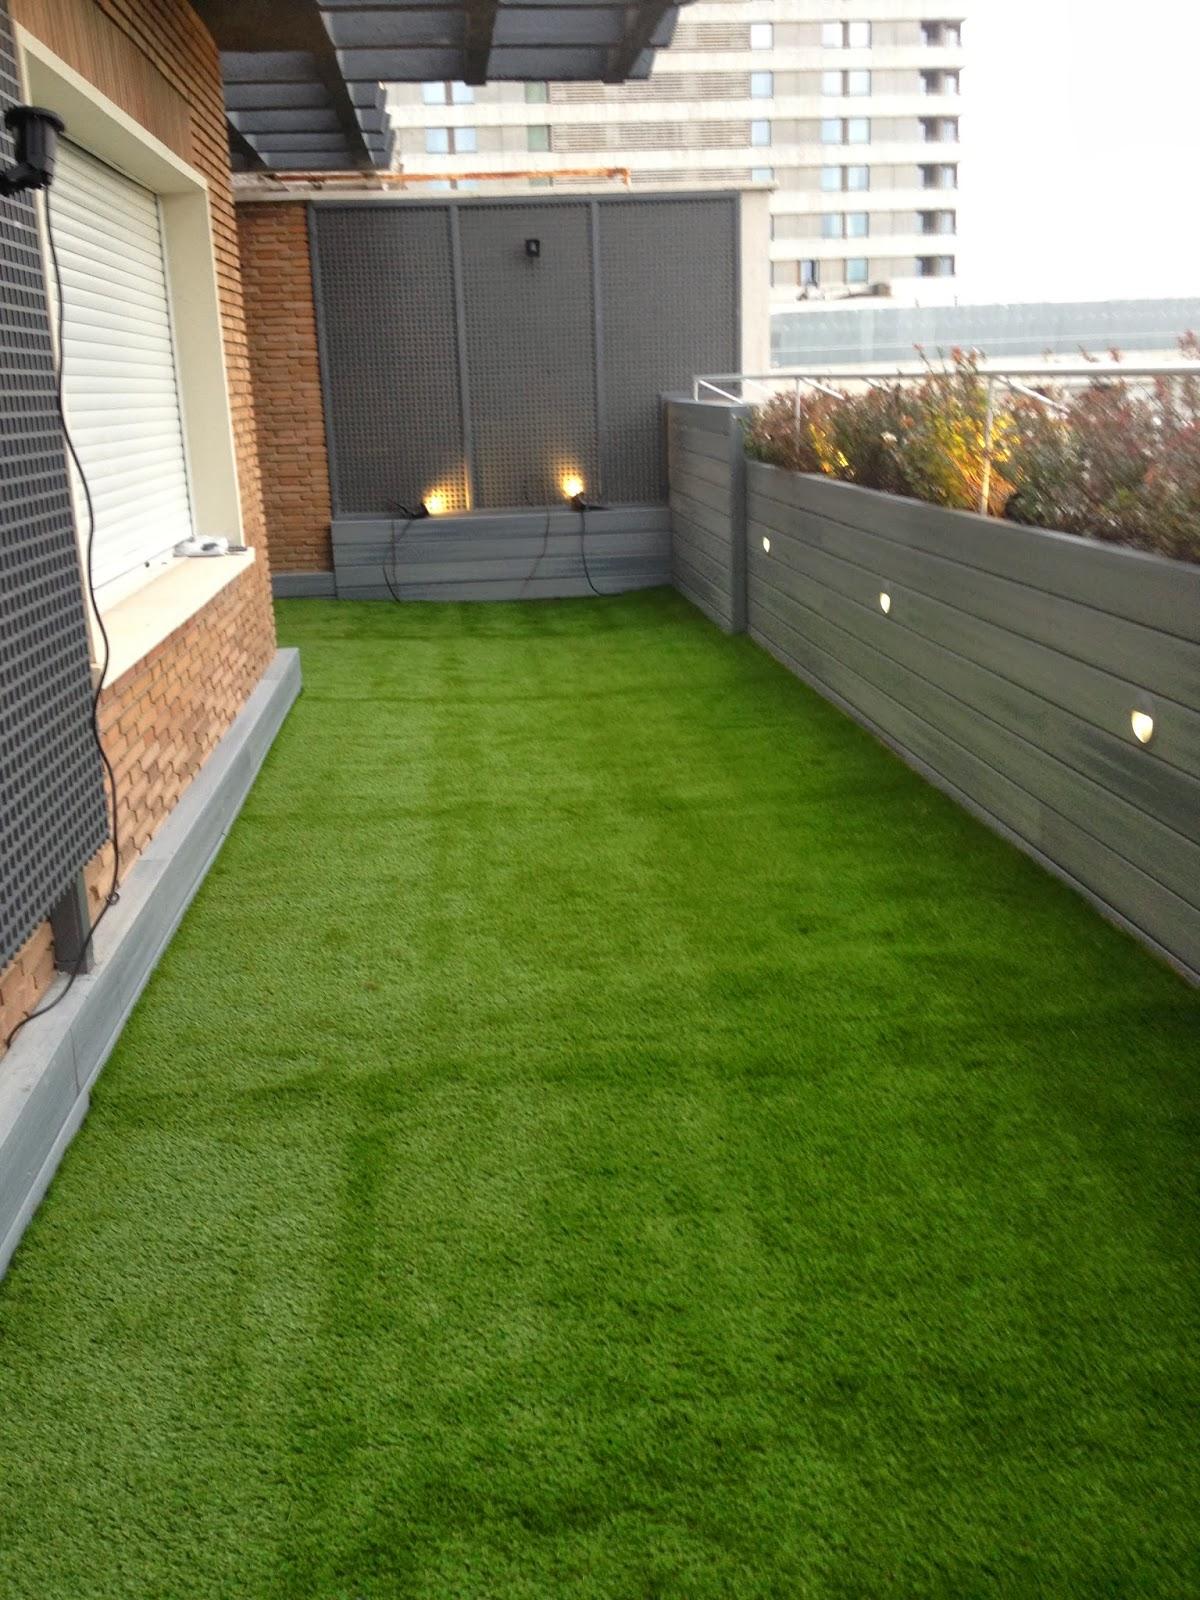 Blog cesped artificial cesped artificial terrazas - Fotos de cesped artificial ...